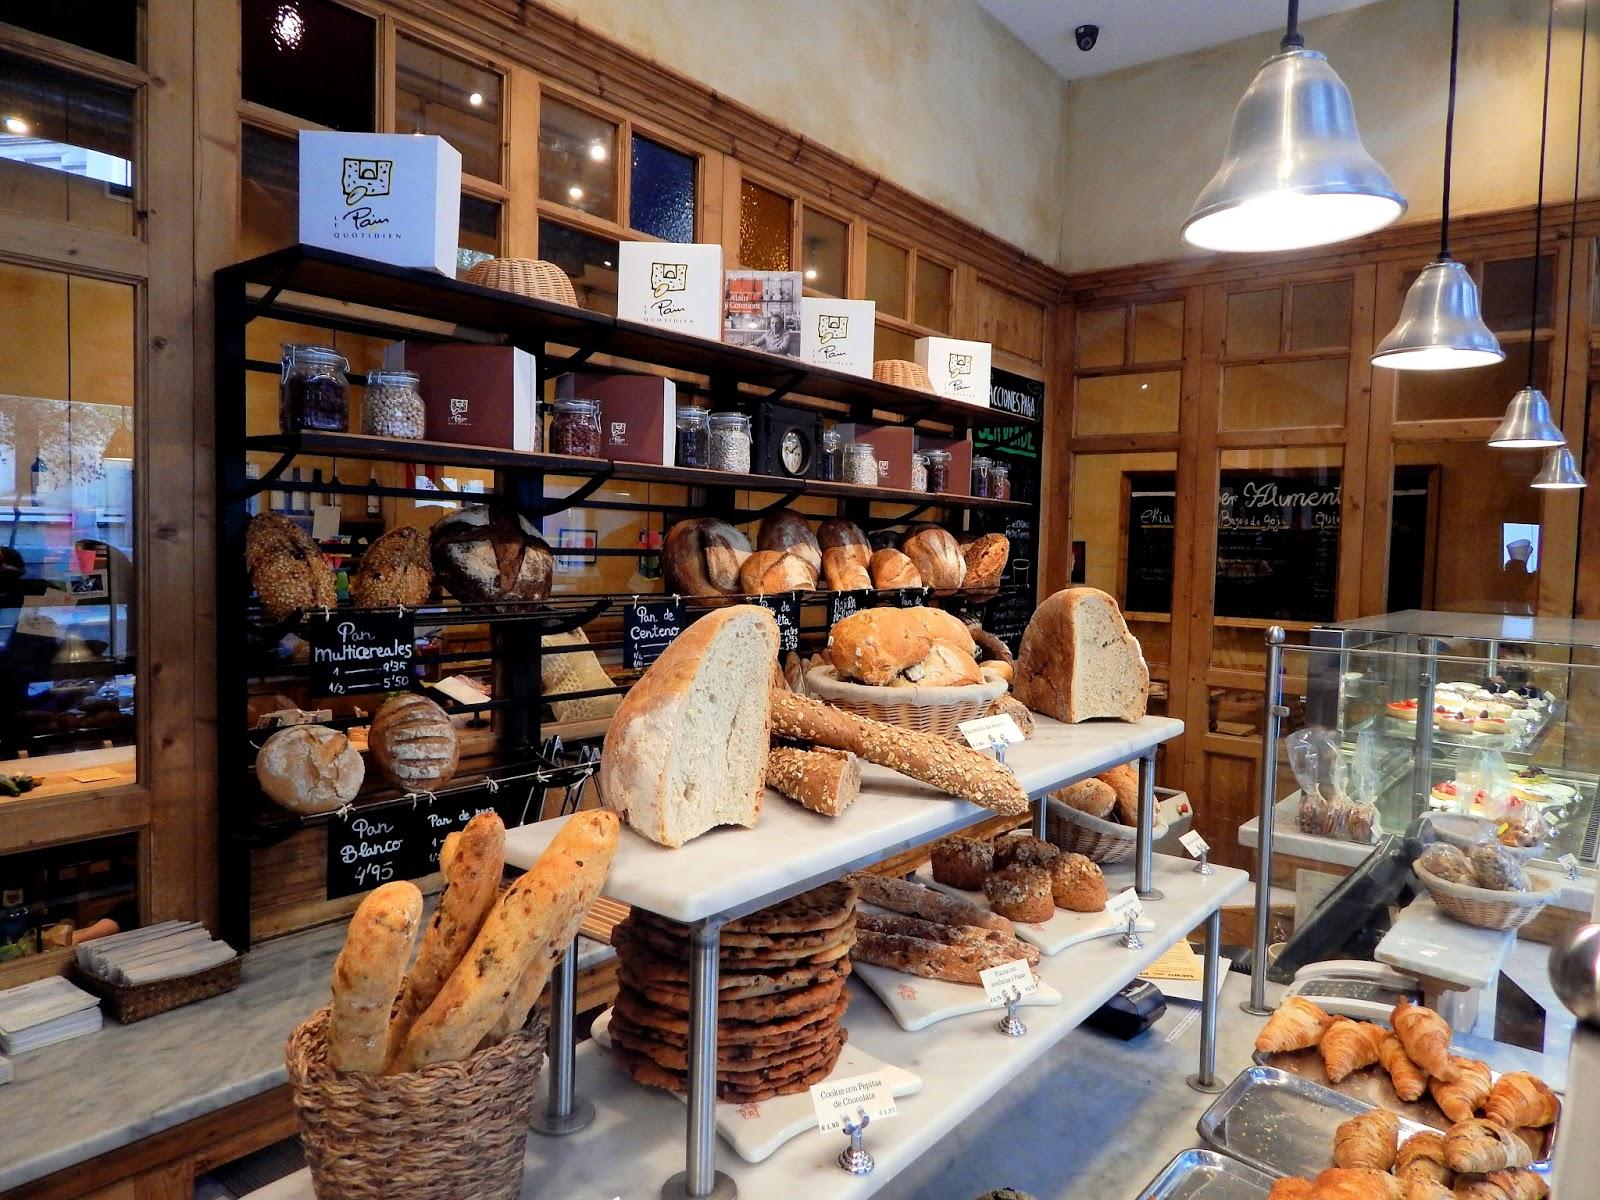 top-brunch-madrid-le-pain-quotidien-mejores-pastelerias-panaderias